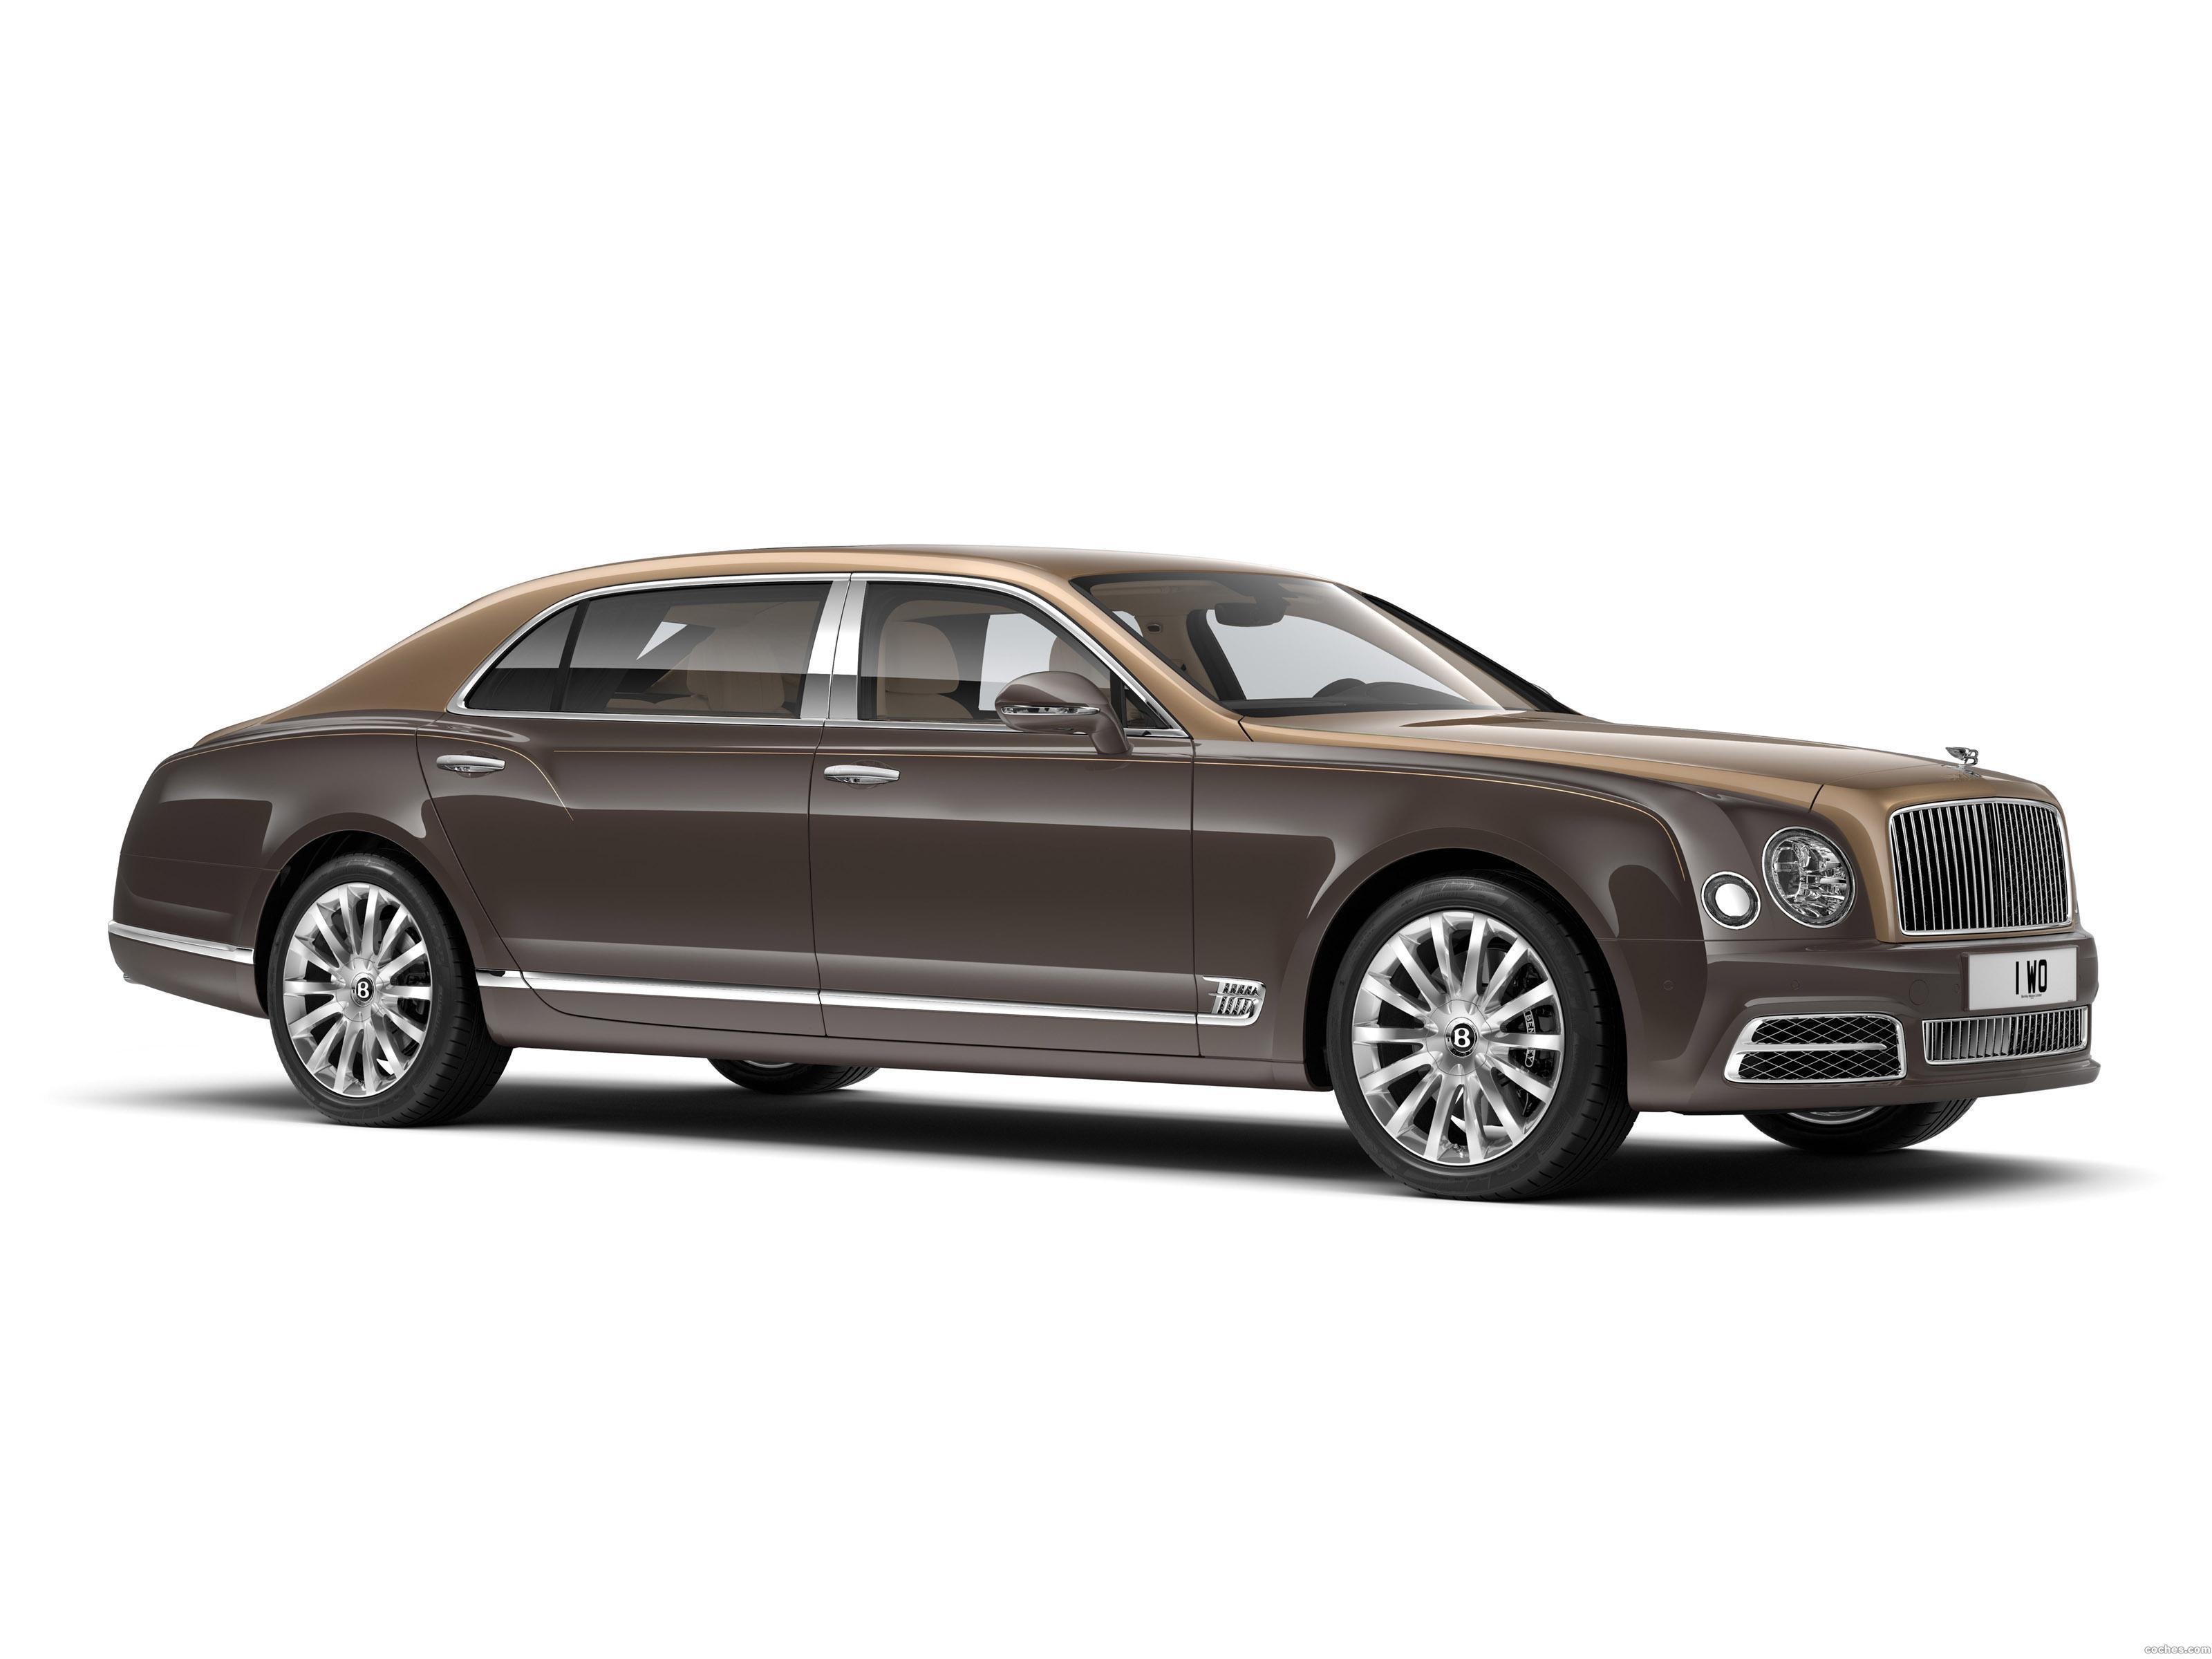 Foto 0 de Bentley Mulsanne Extended Wheelbase First Edition 2016